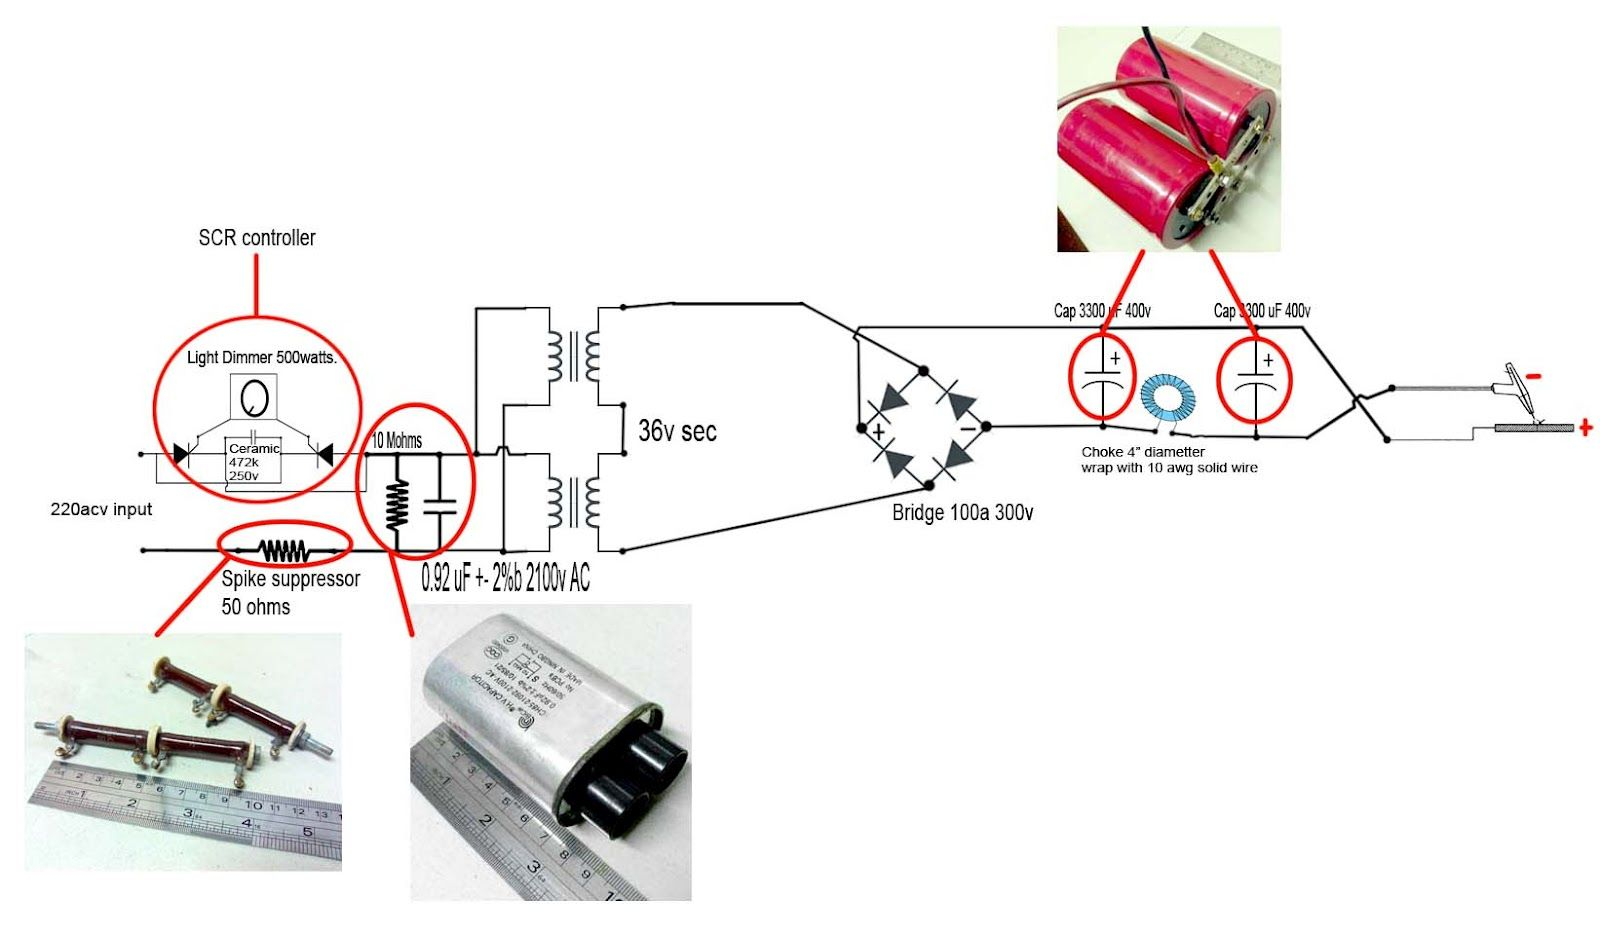 tig schematics and components st500f1200 30ee tig pinterest diy tig welder schematic diy get free image about wiring diagram [ 1600 x 937 Pixel ]